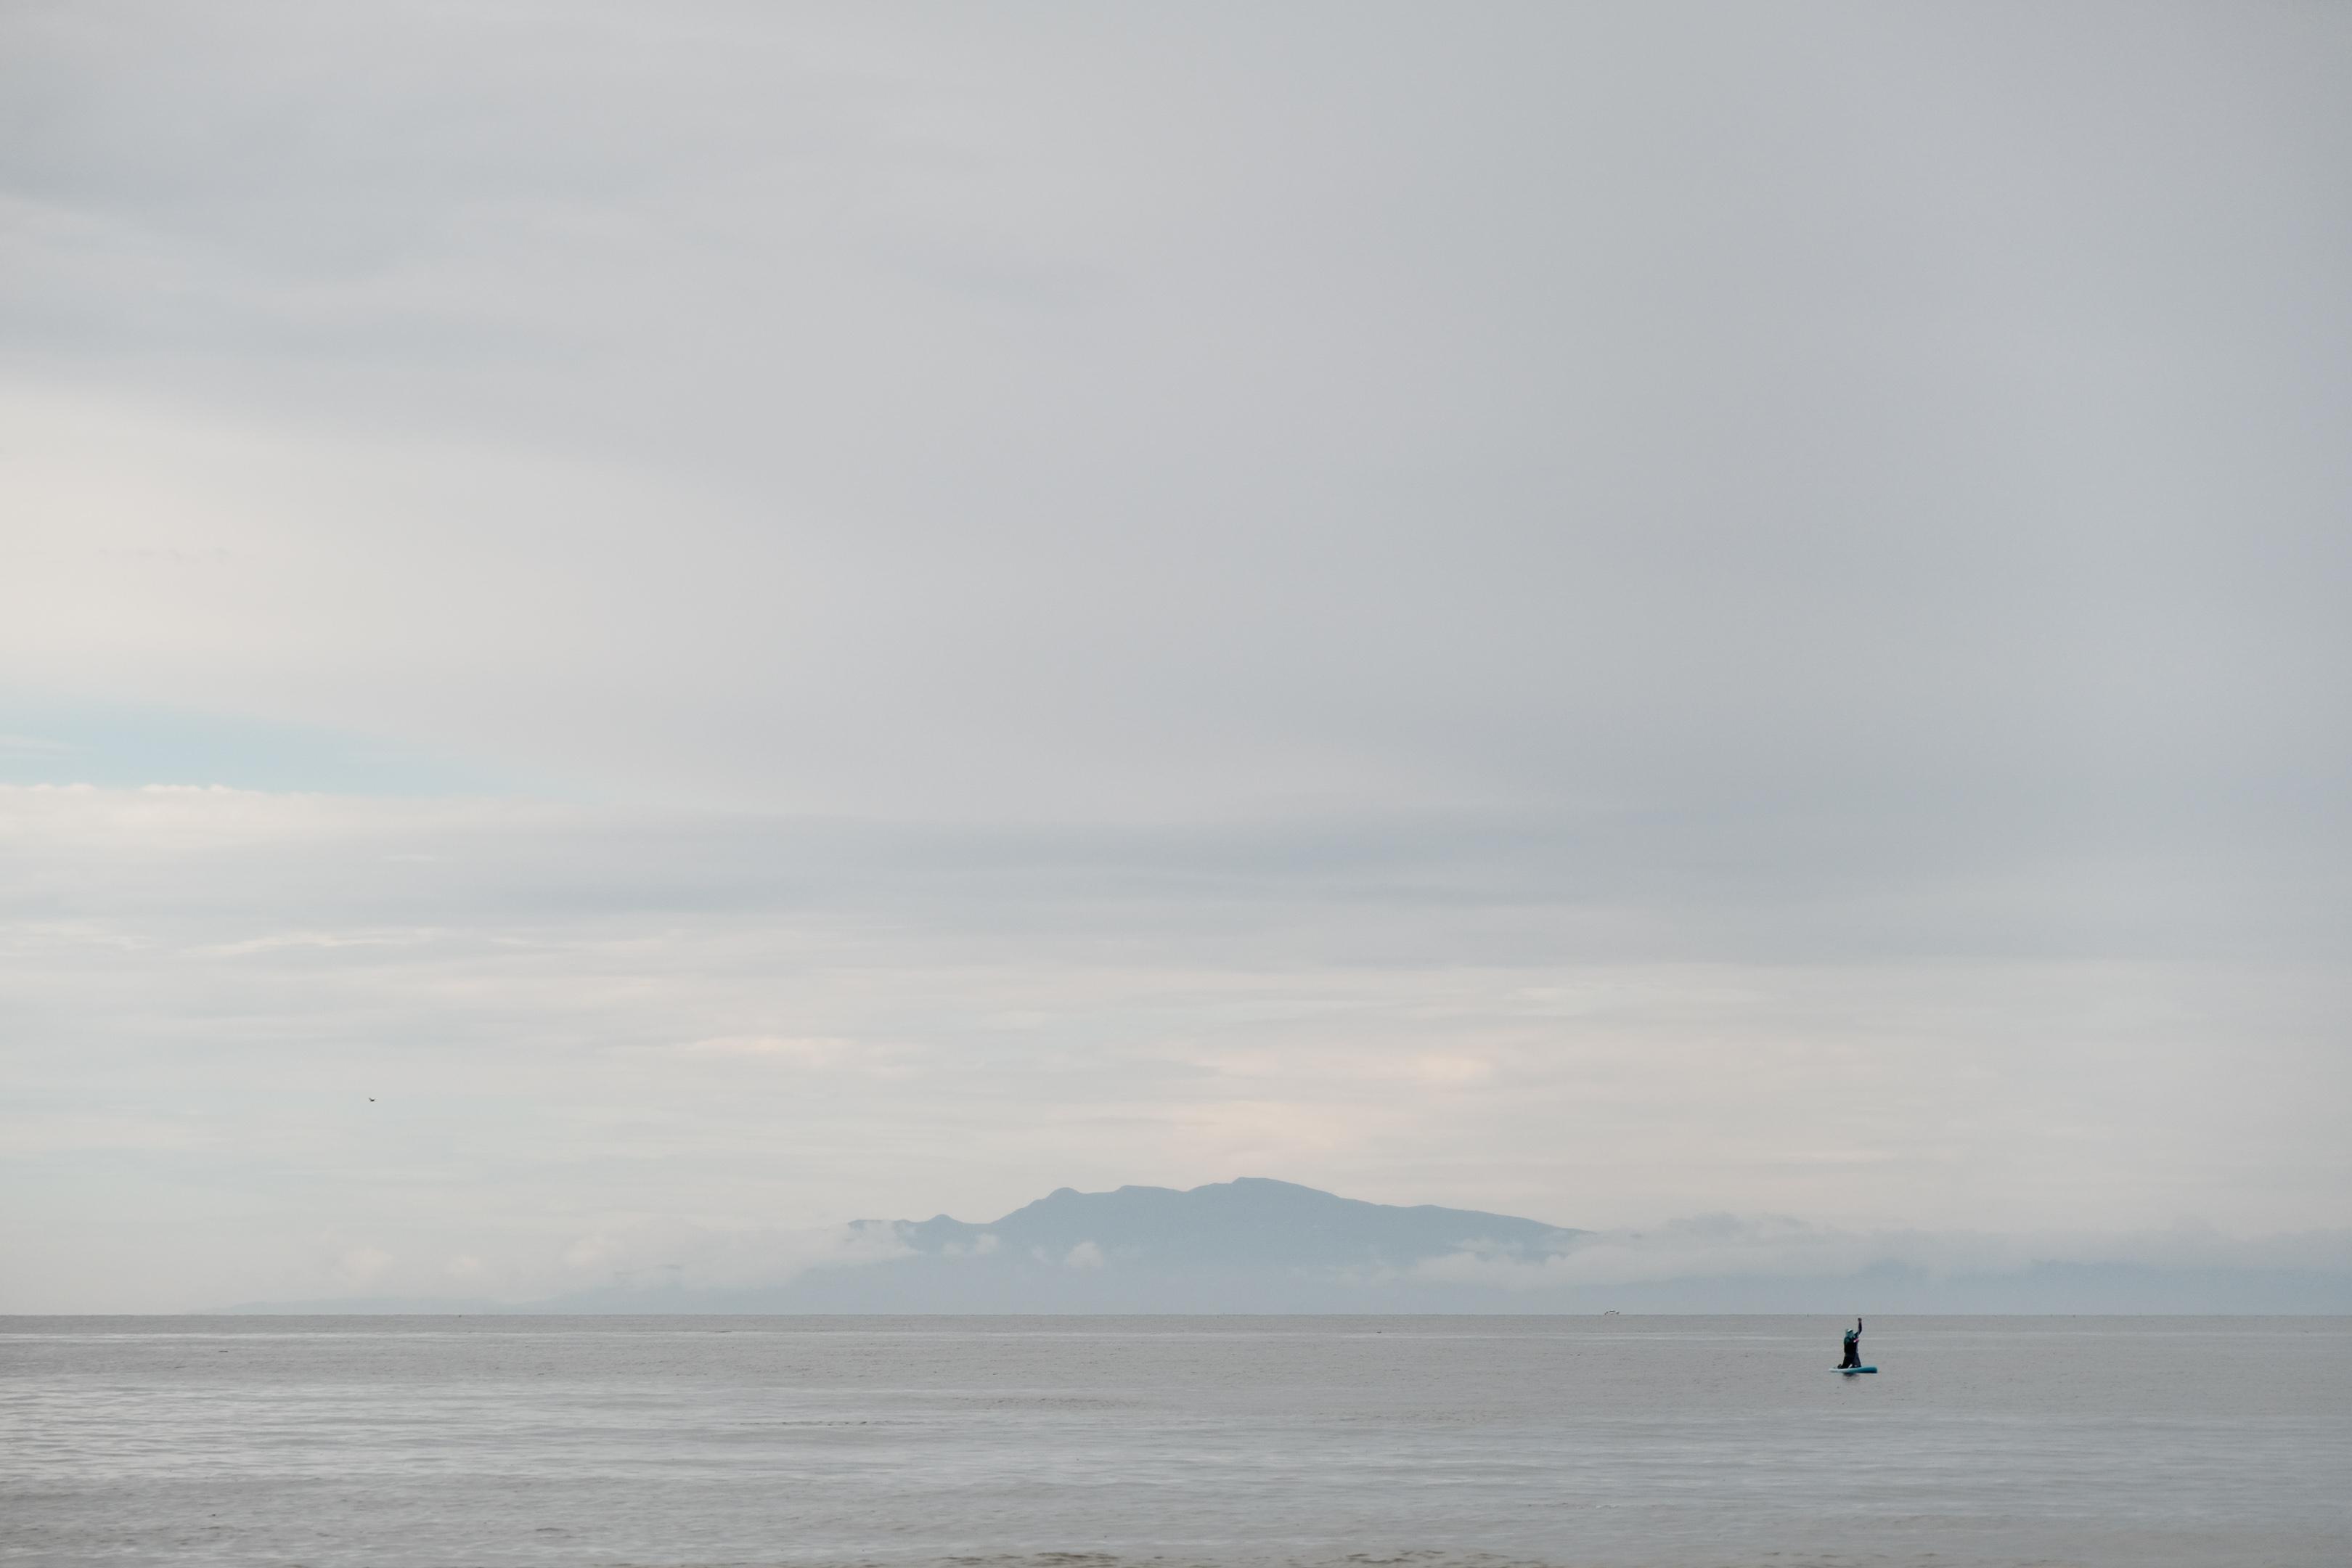 Kamakuras pludmale